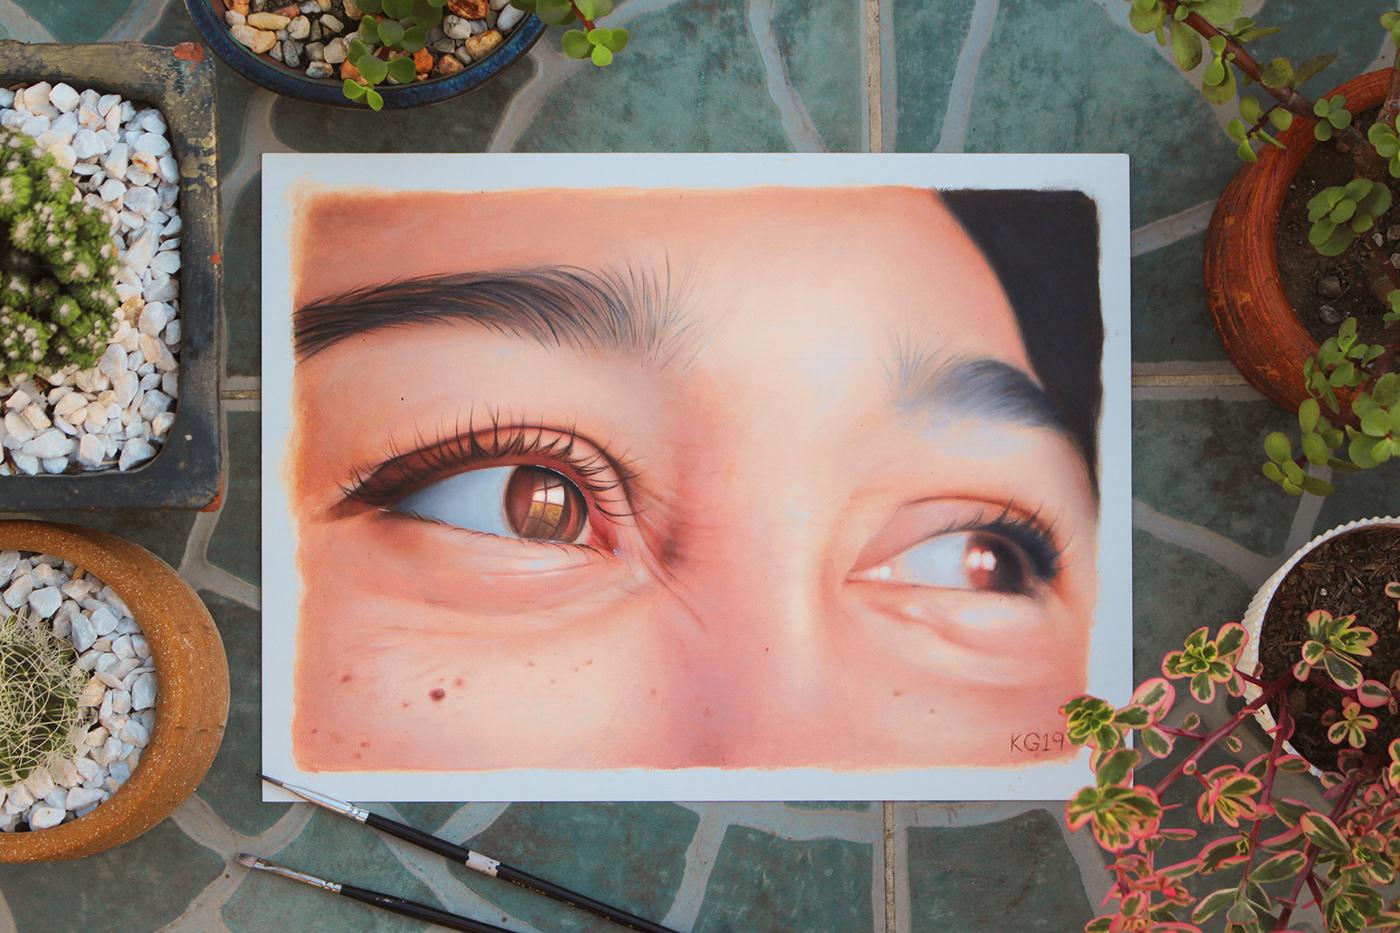 Image may contain: eyes, face and human face